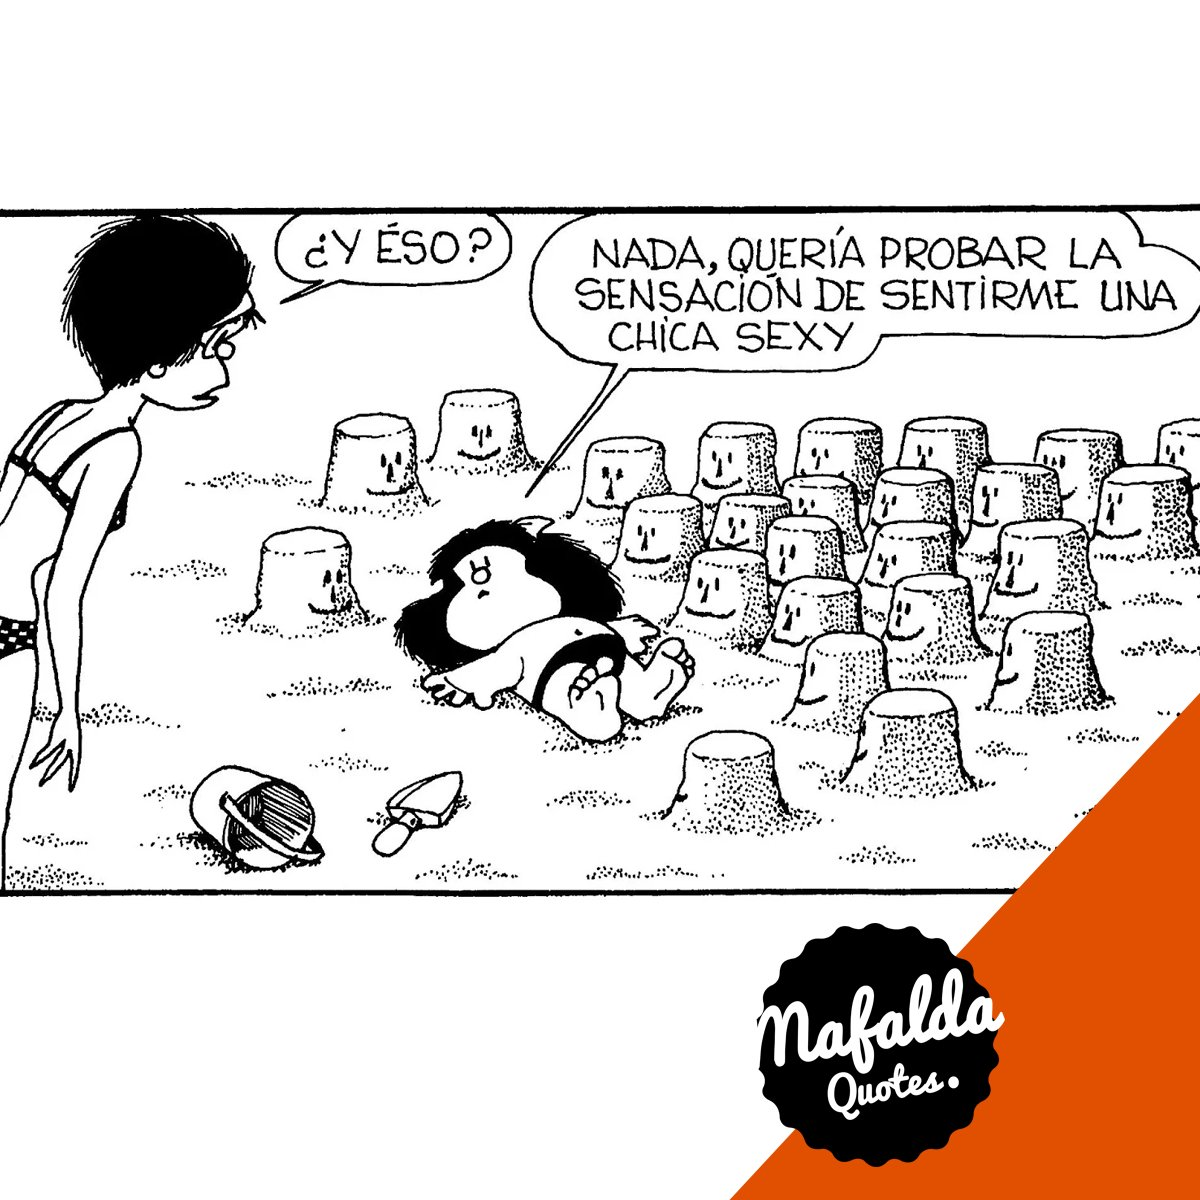 ¡Arriba el autoestima! #MafaldaQuotes #Mafalda #Quino https://t.co/7bySlyp0dQ